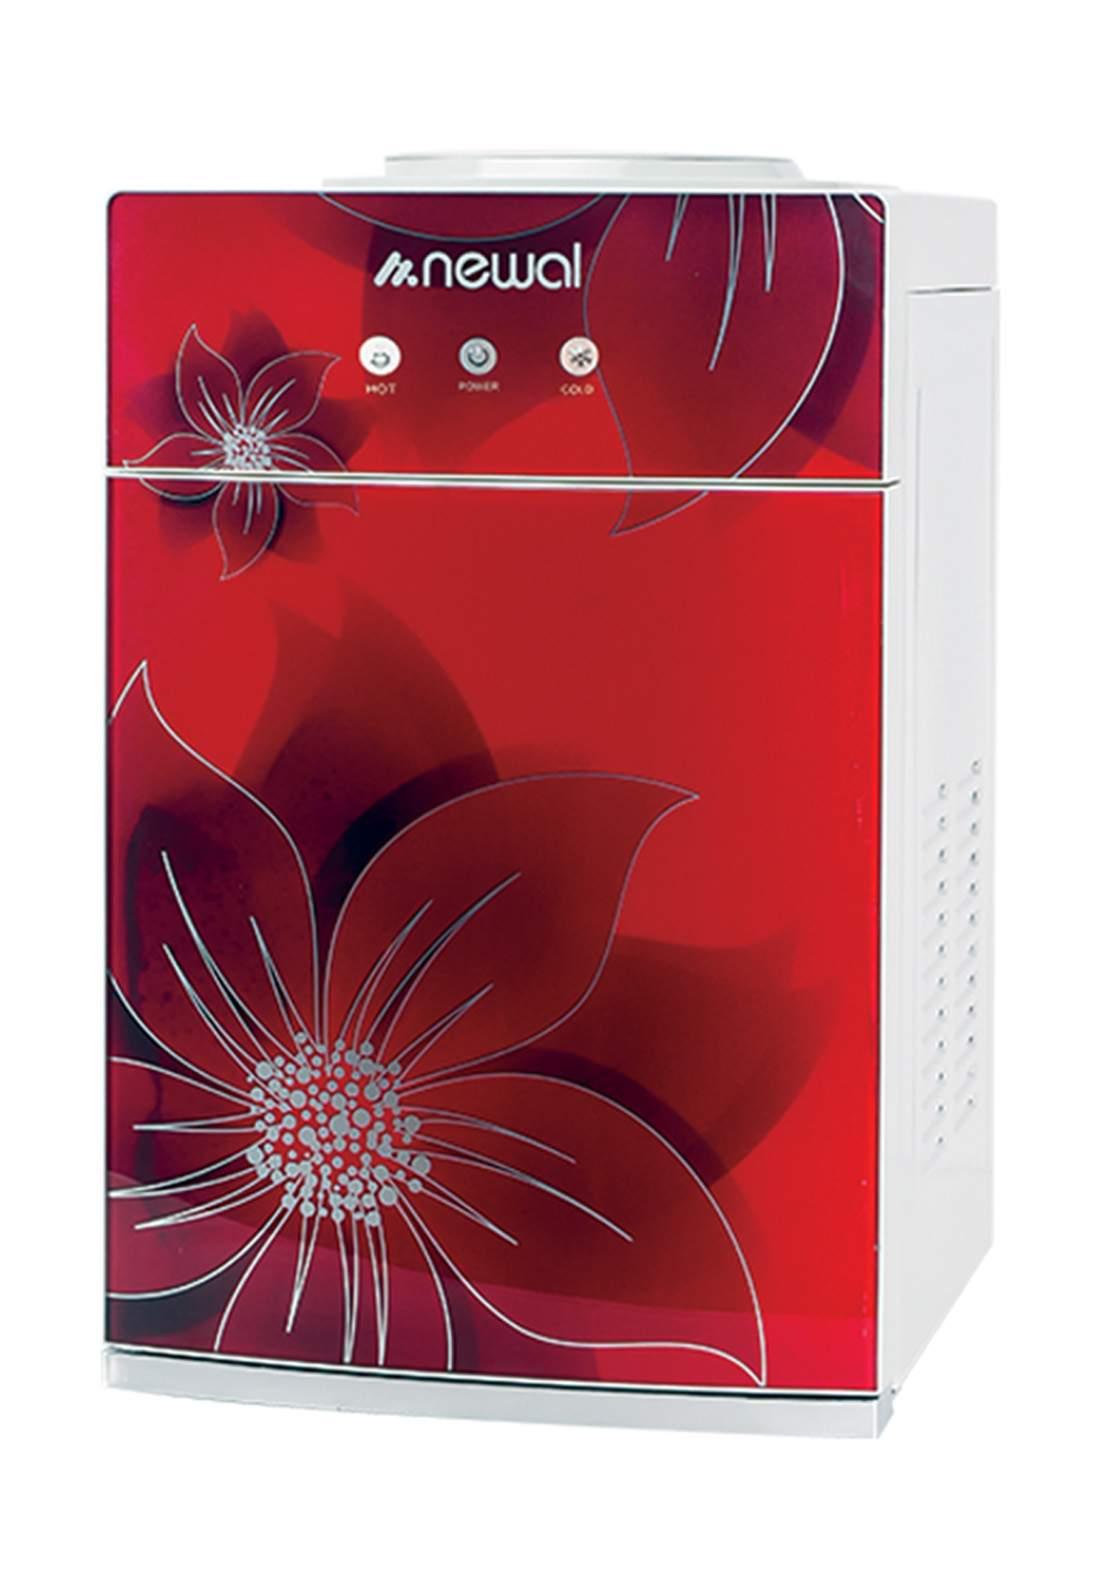 Newal WTD-044-03 Water Dispenser براد ماء